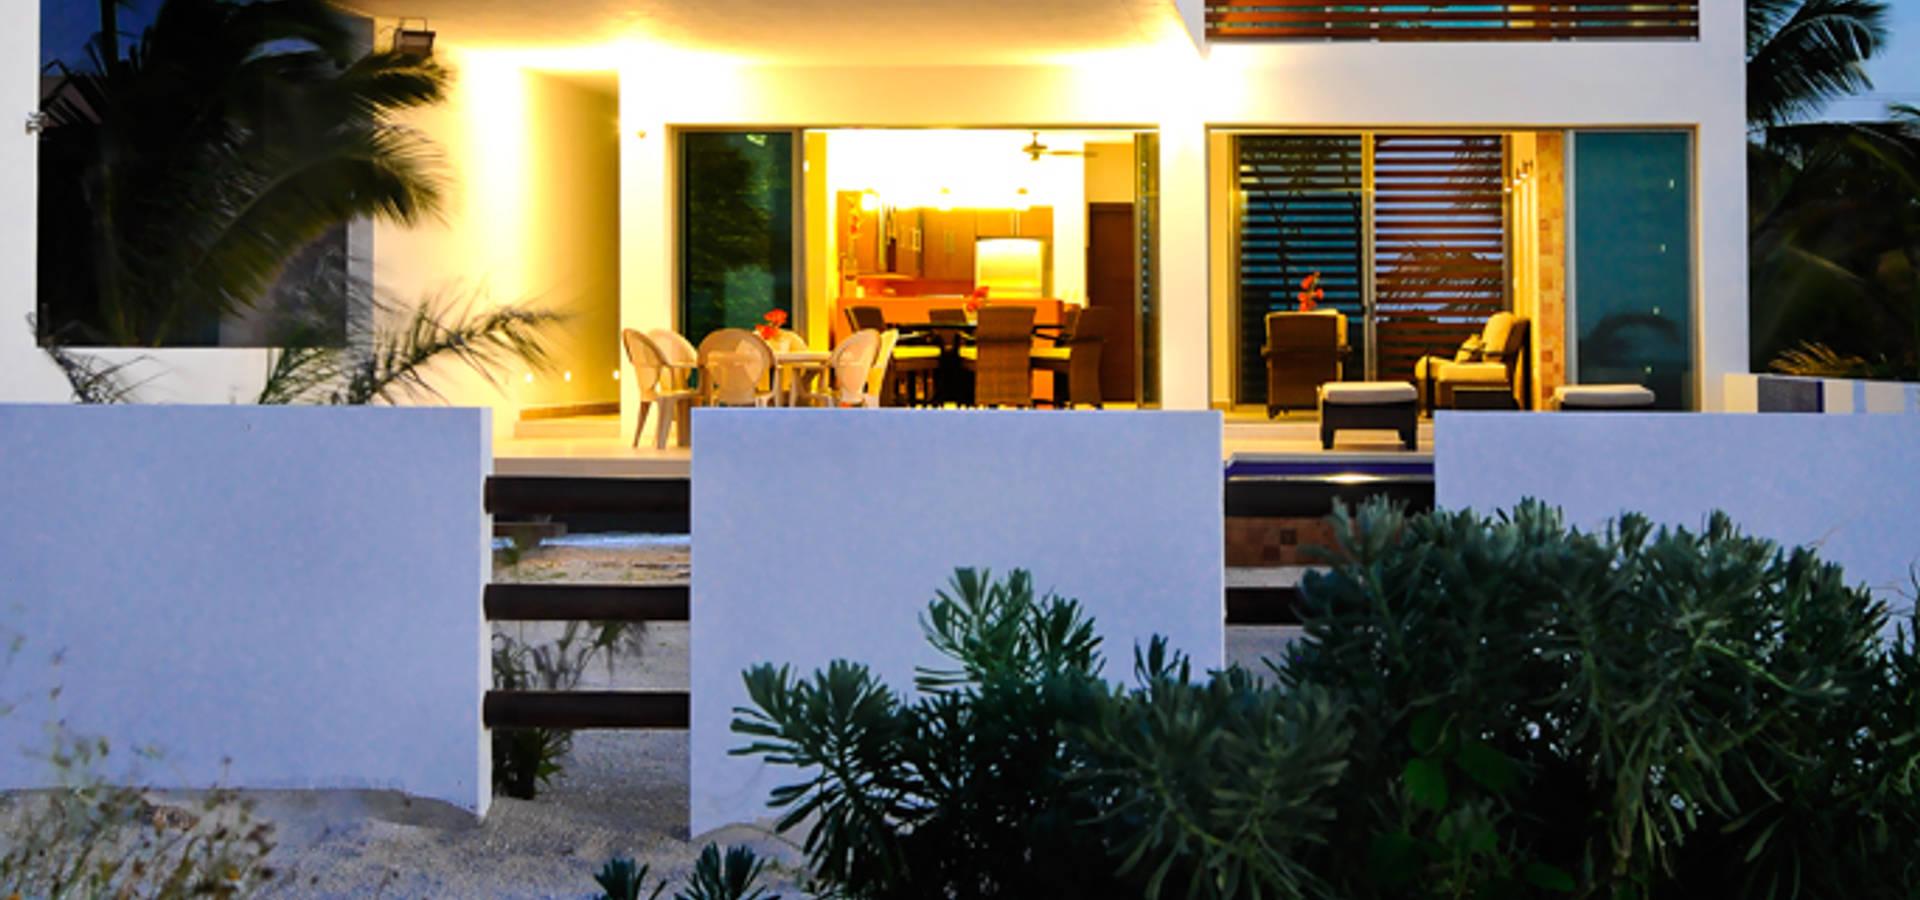 Hängeleuchte Modern lizzie valencia arquitectura dise 241 o 의 casa ha uay homify